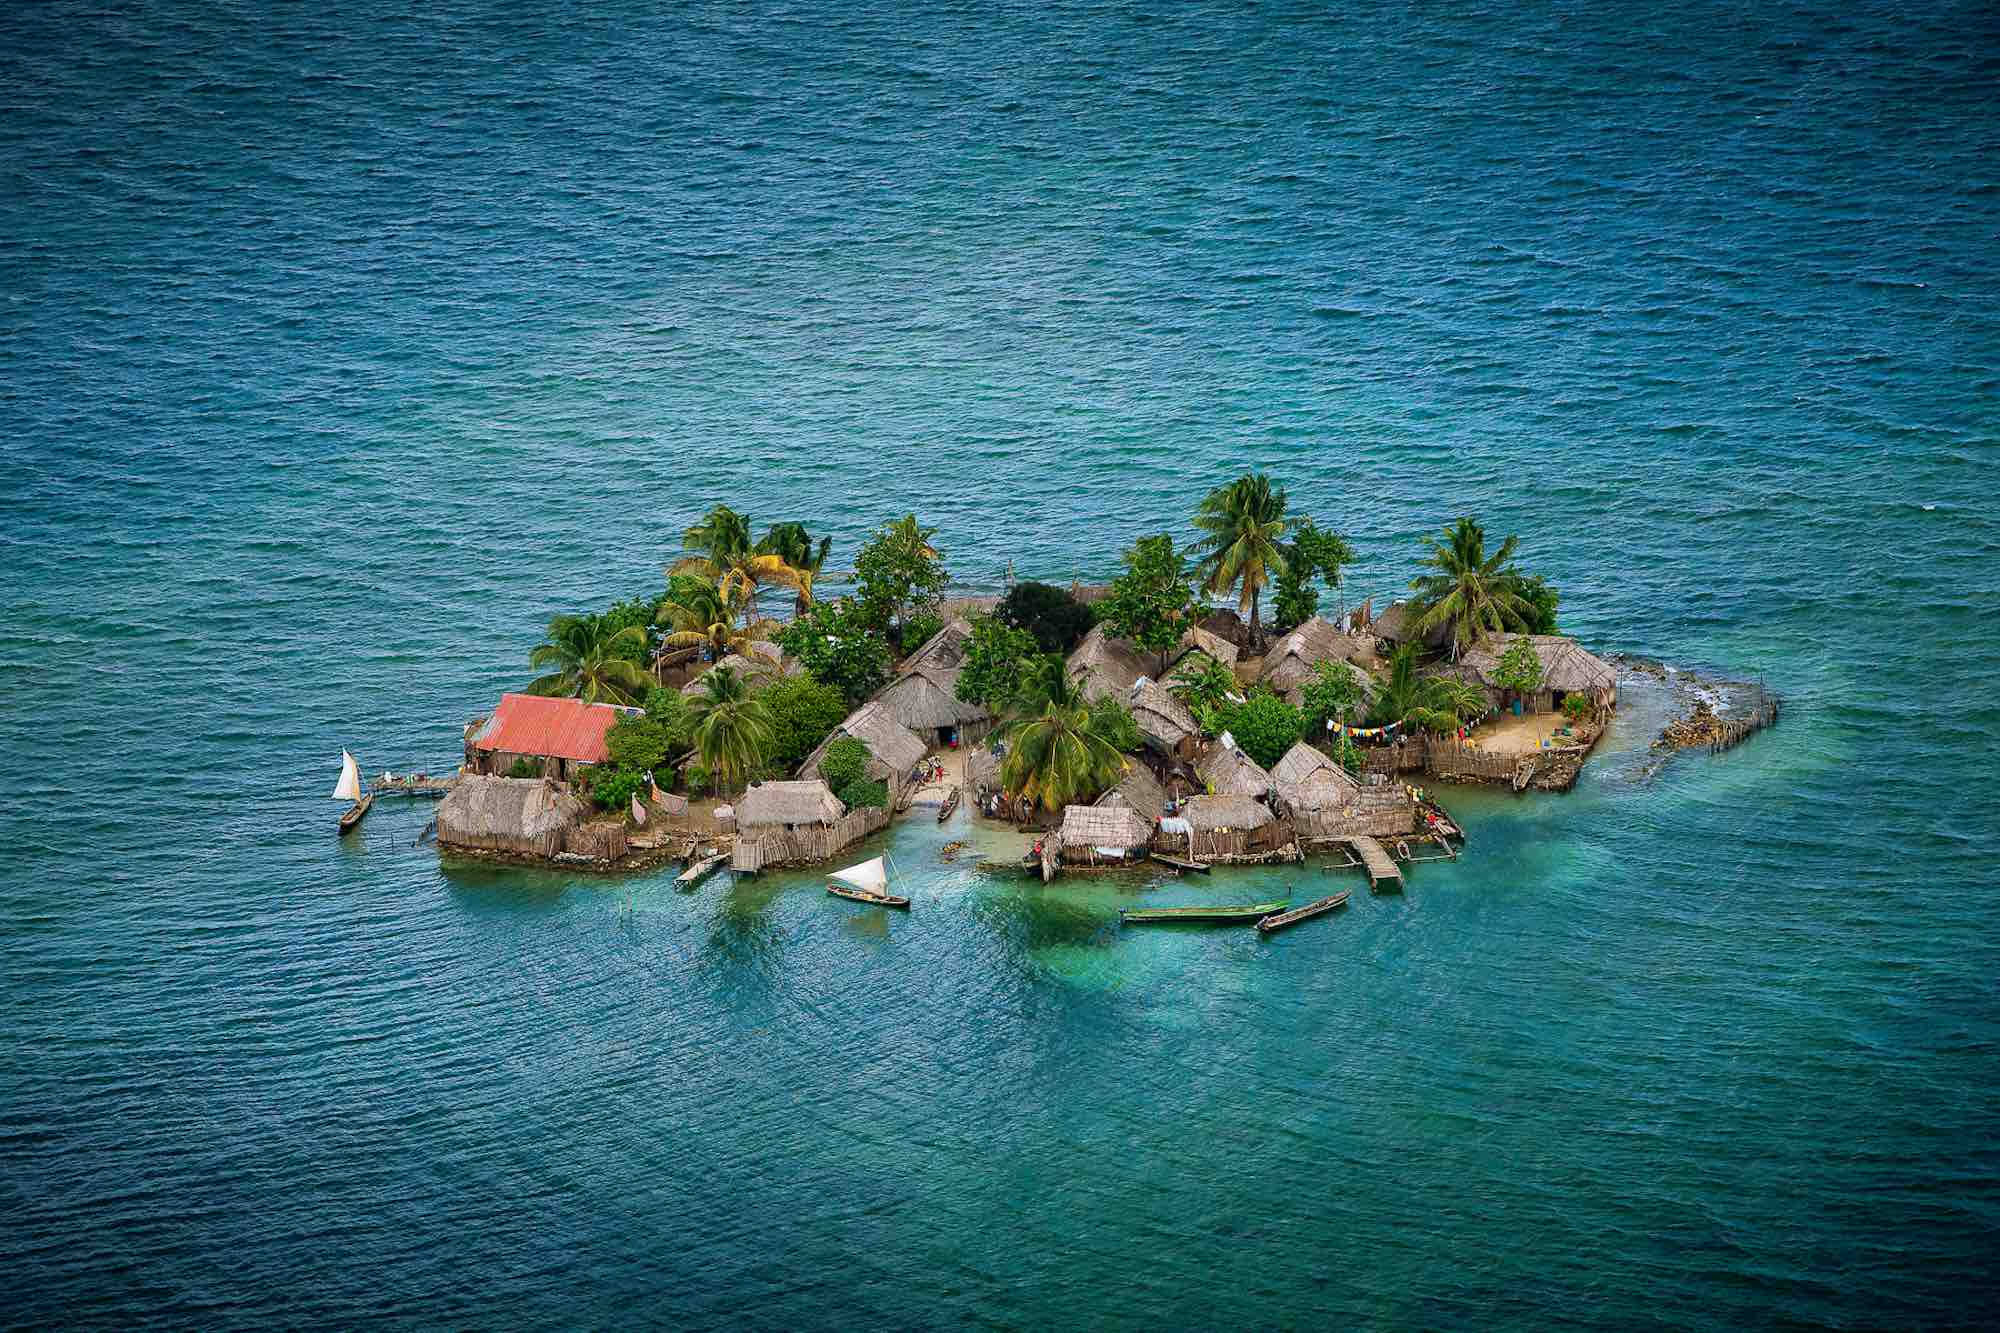 Robeson Islands - Yann Arthus-Bertrand